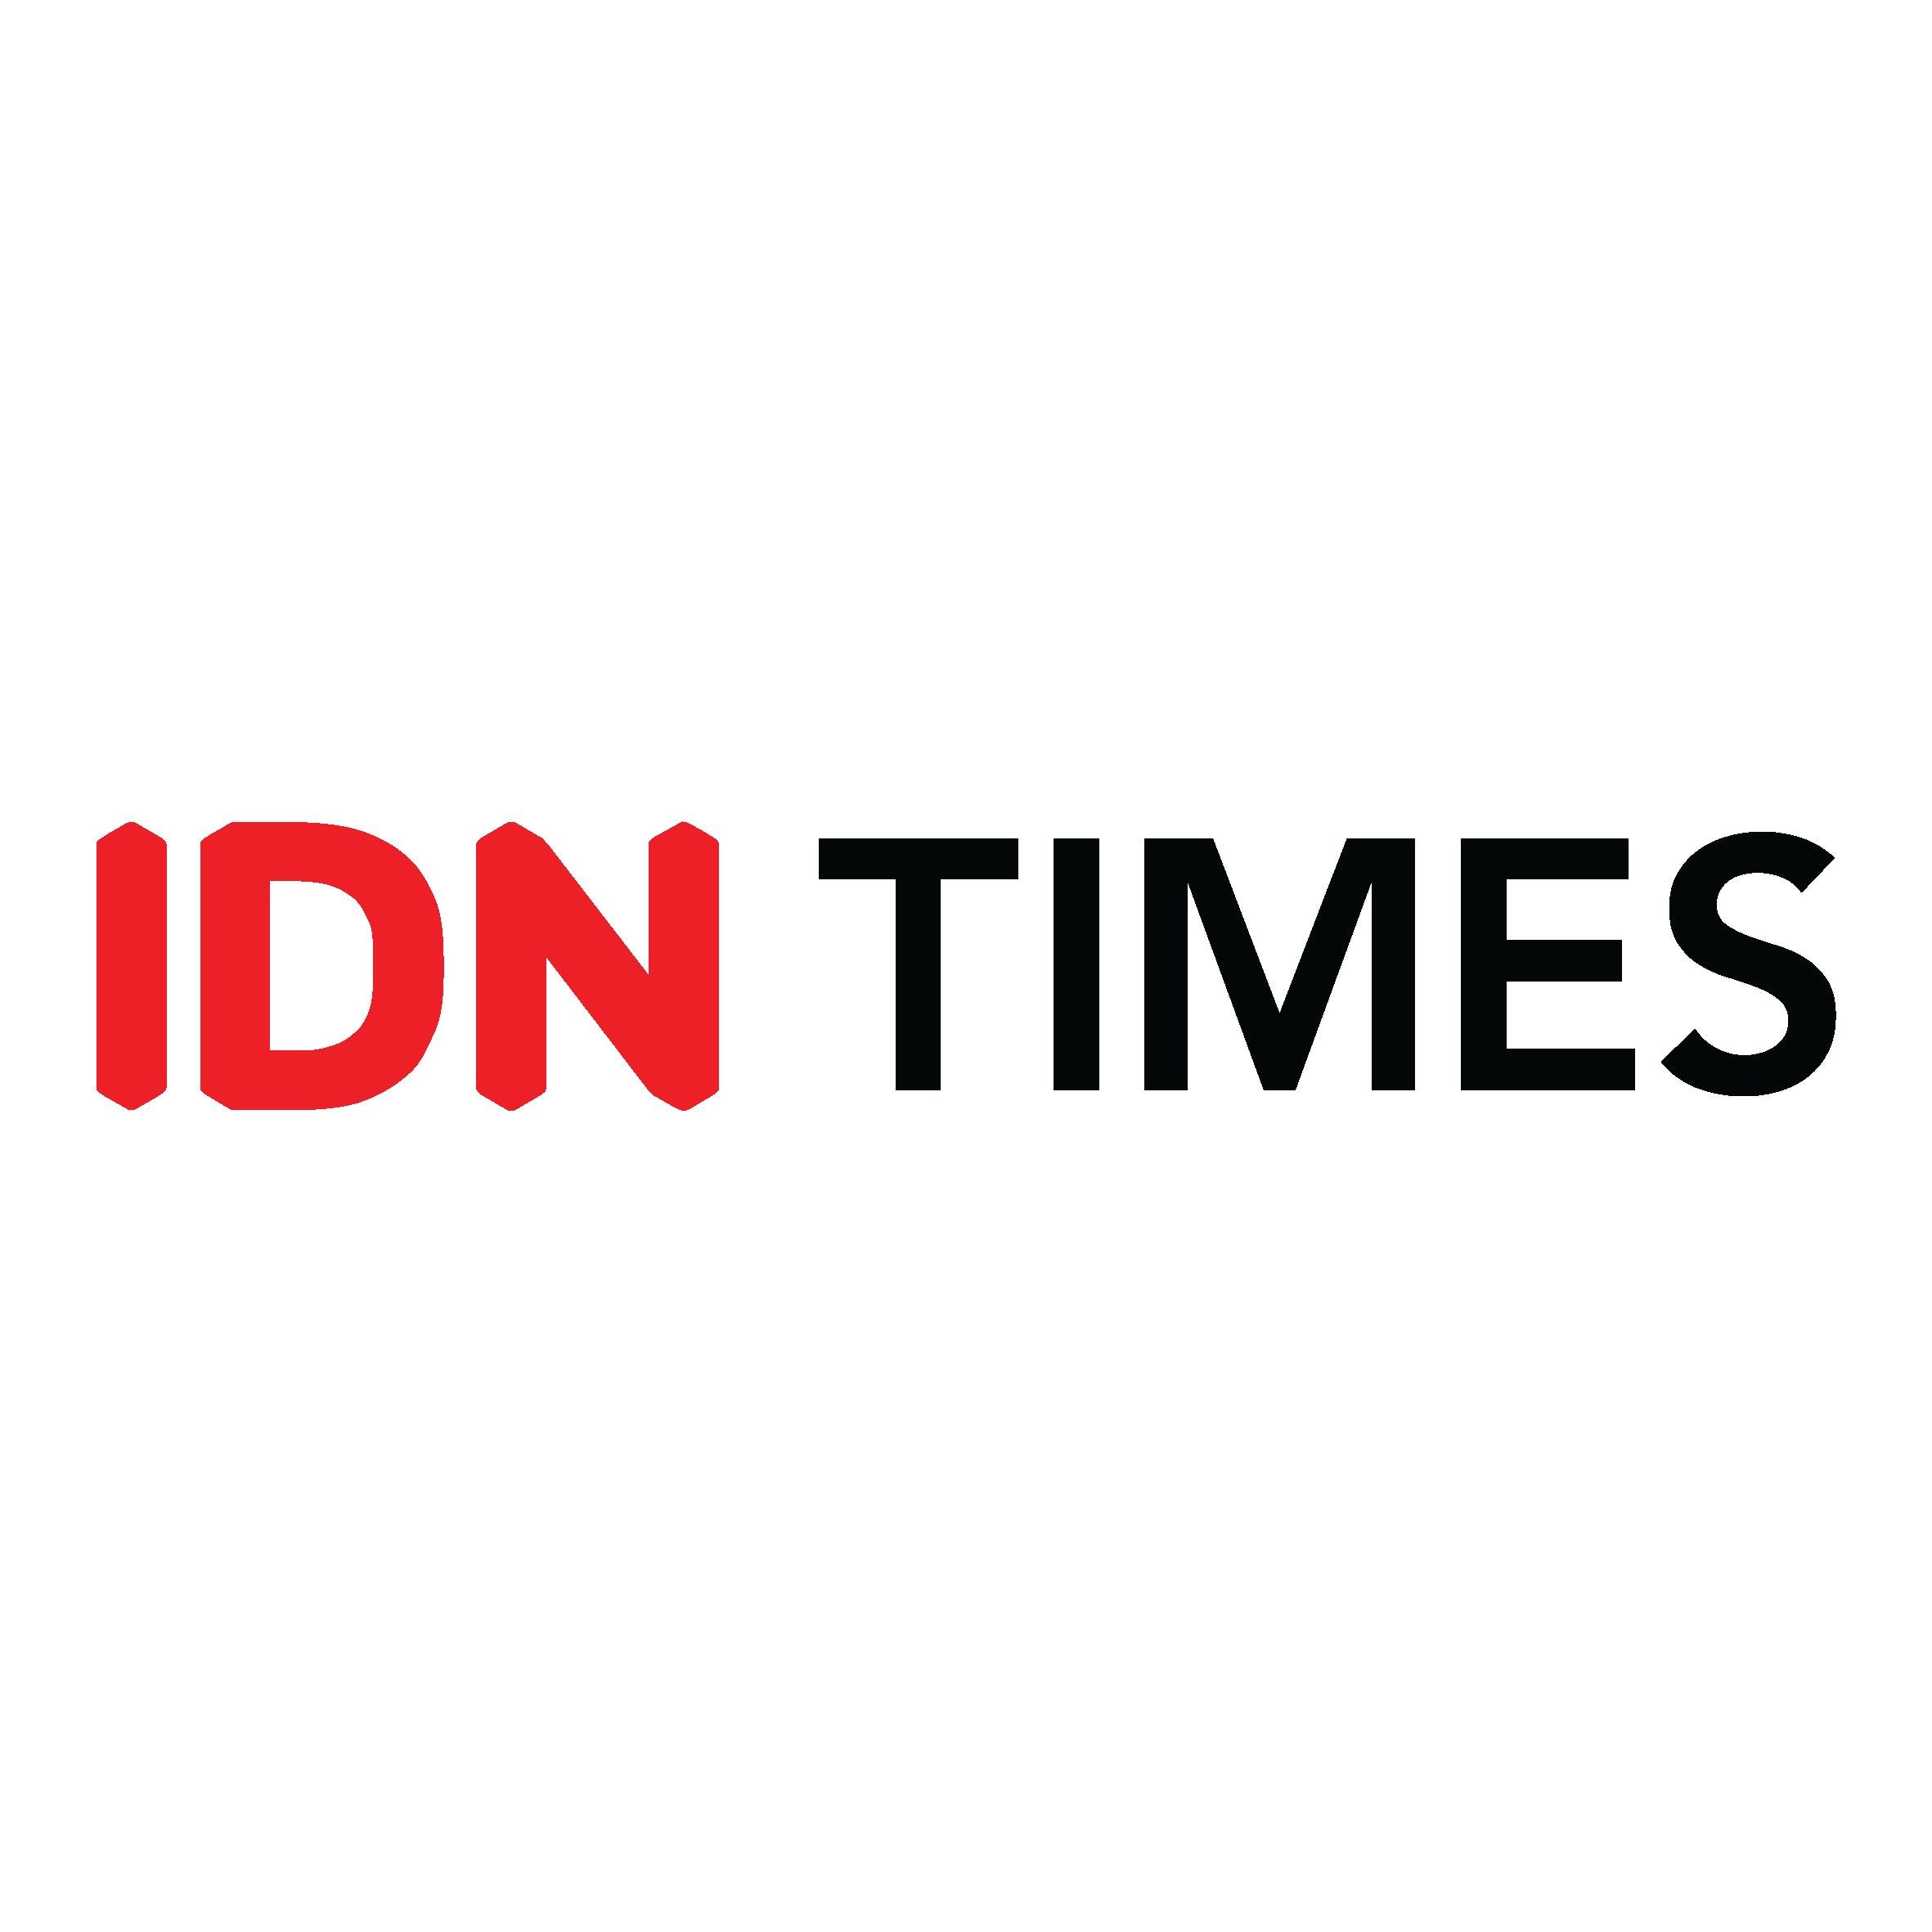 Logo IDN Times.png